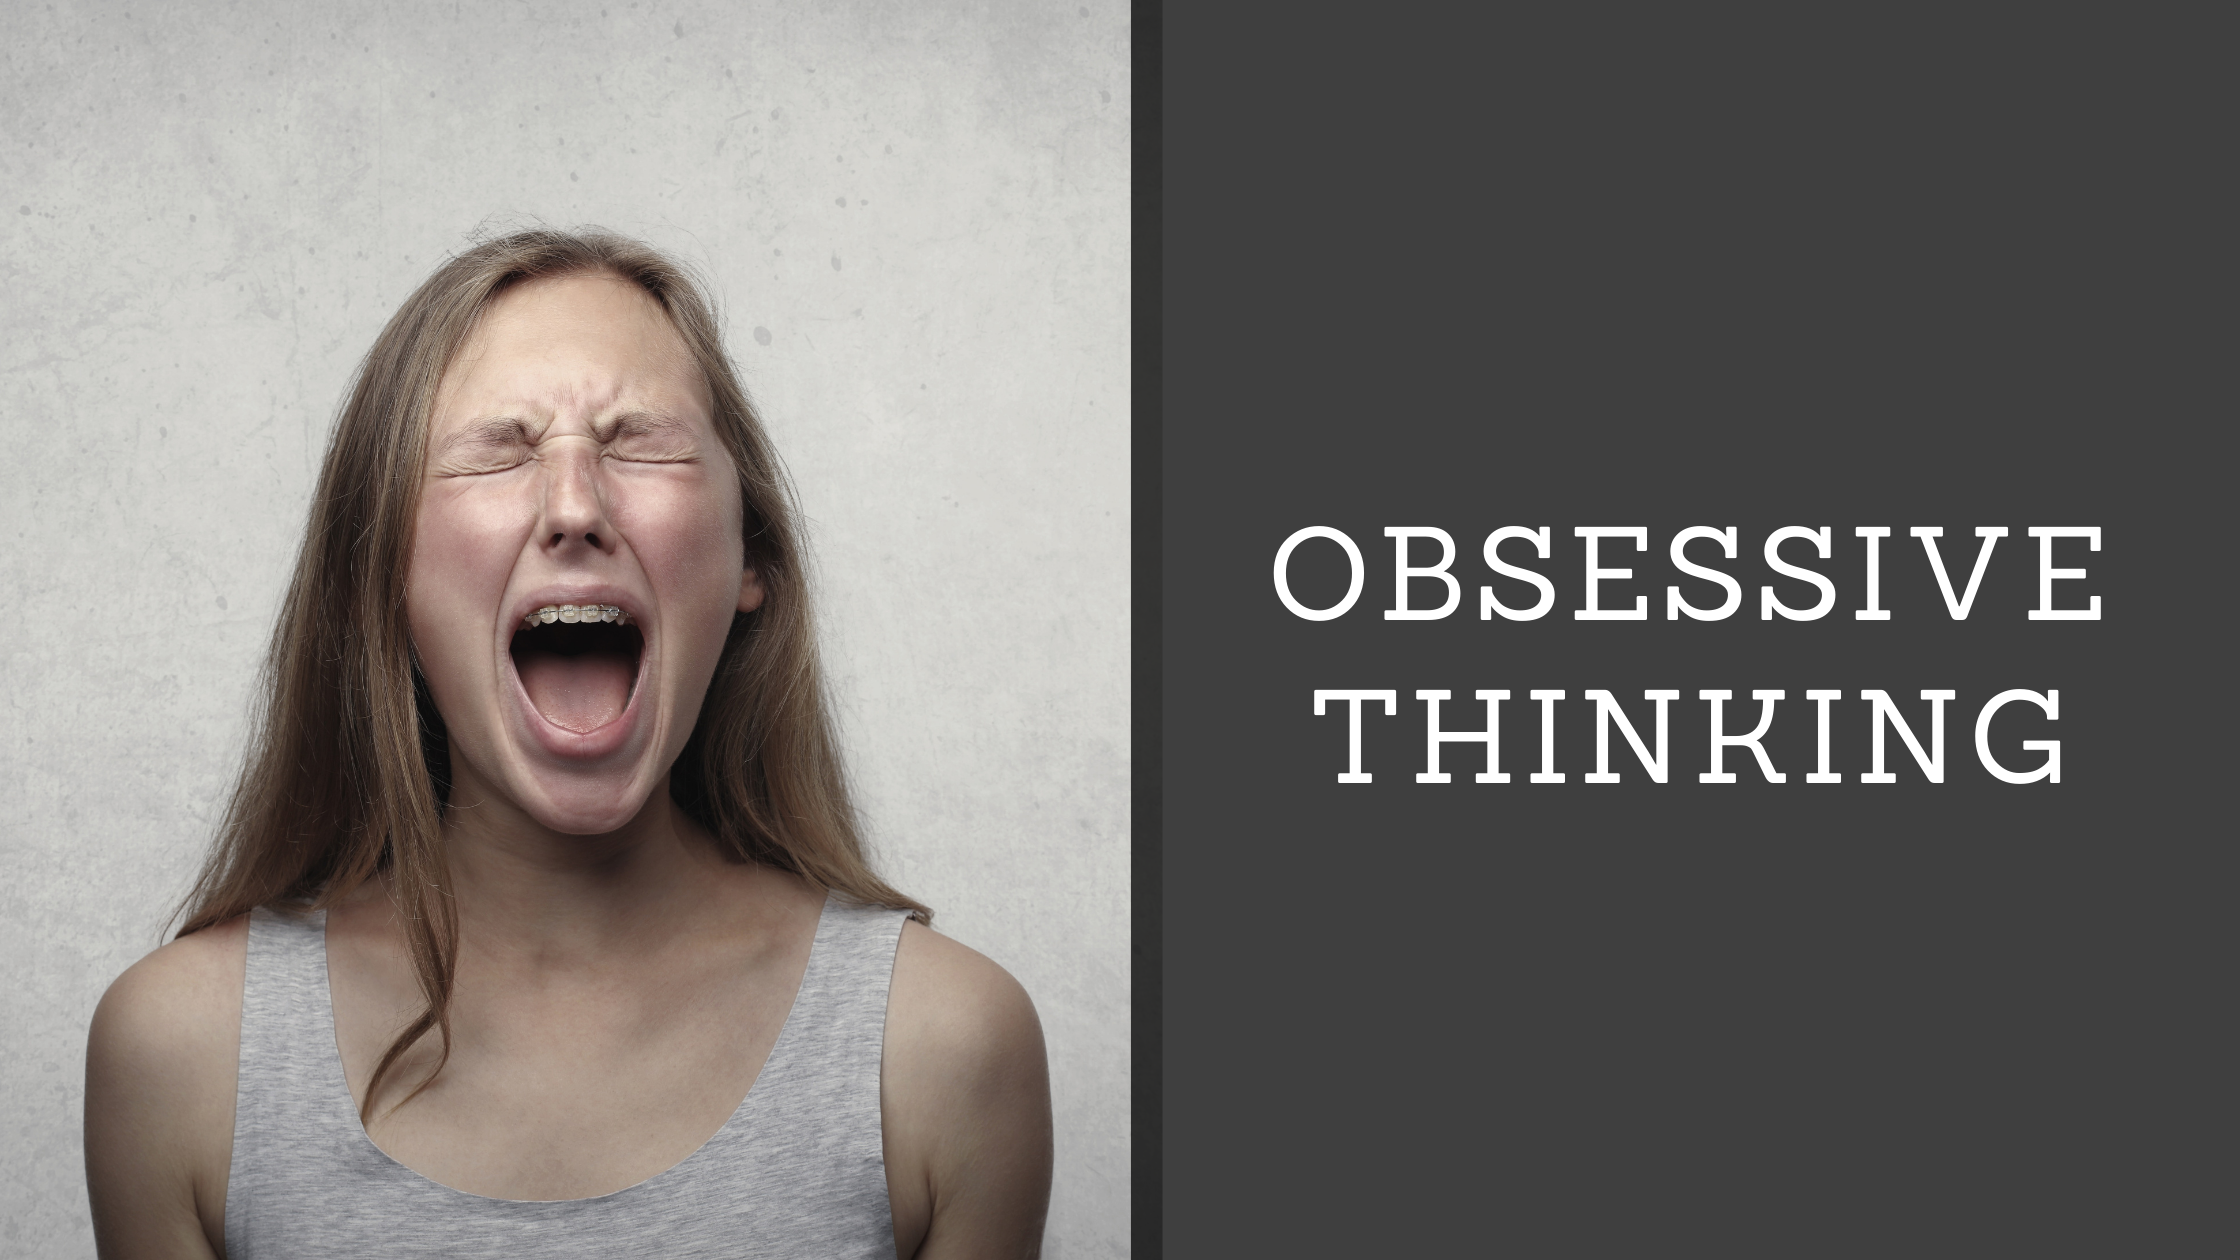 Obsessive Thinking